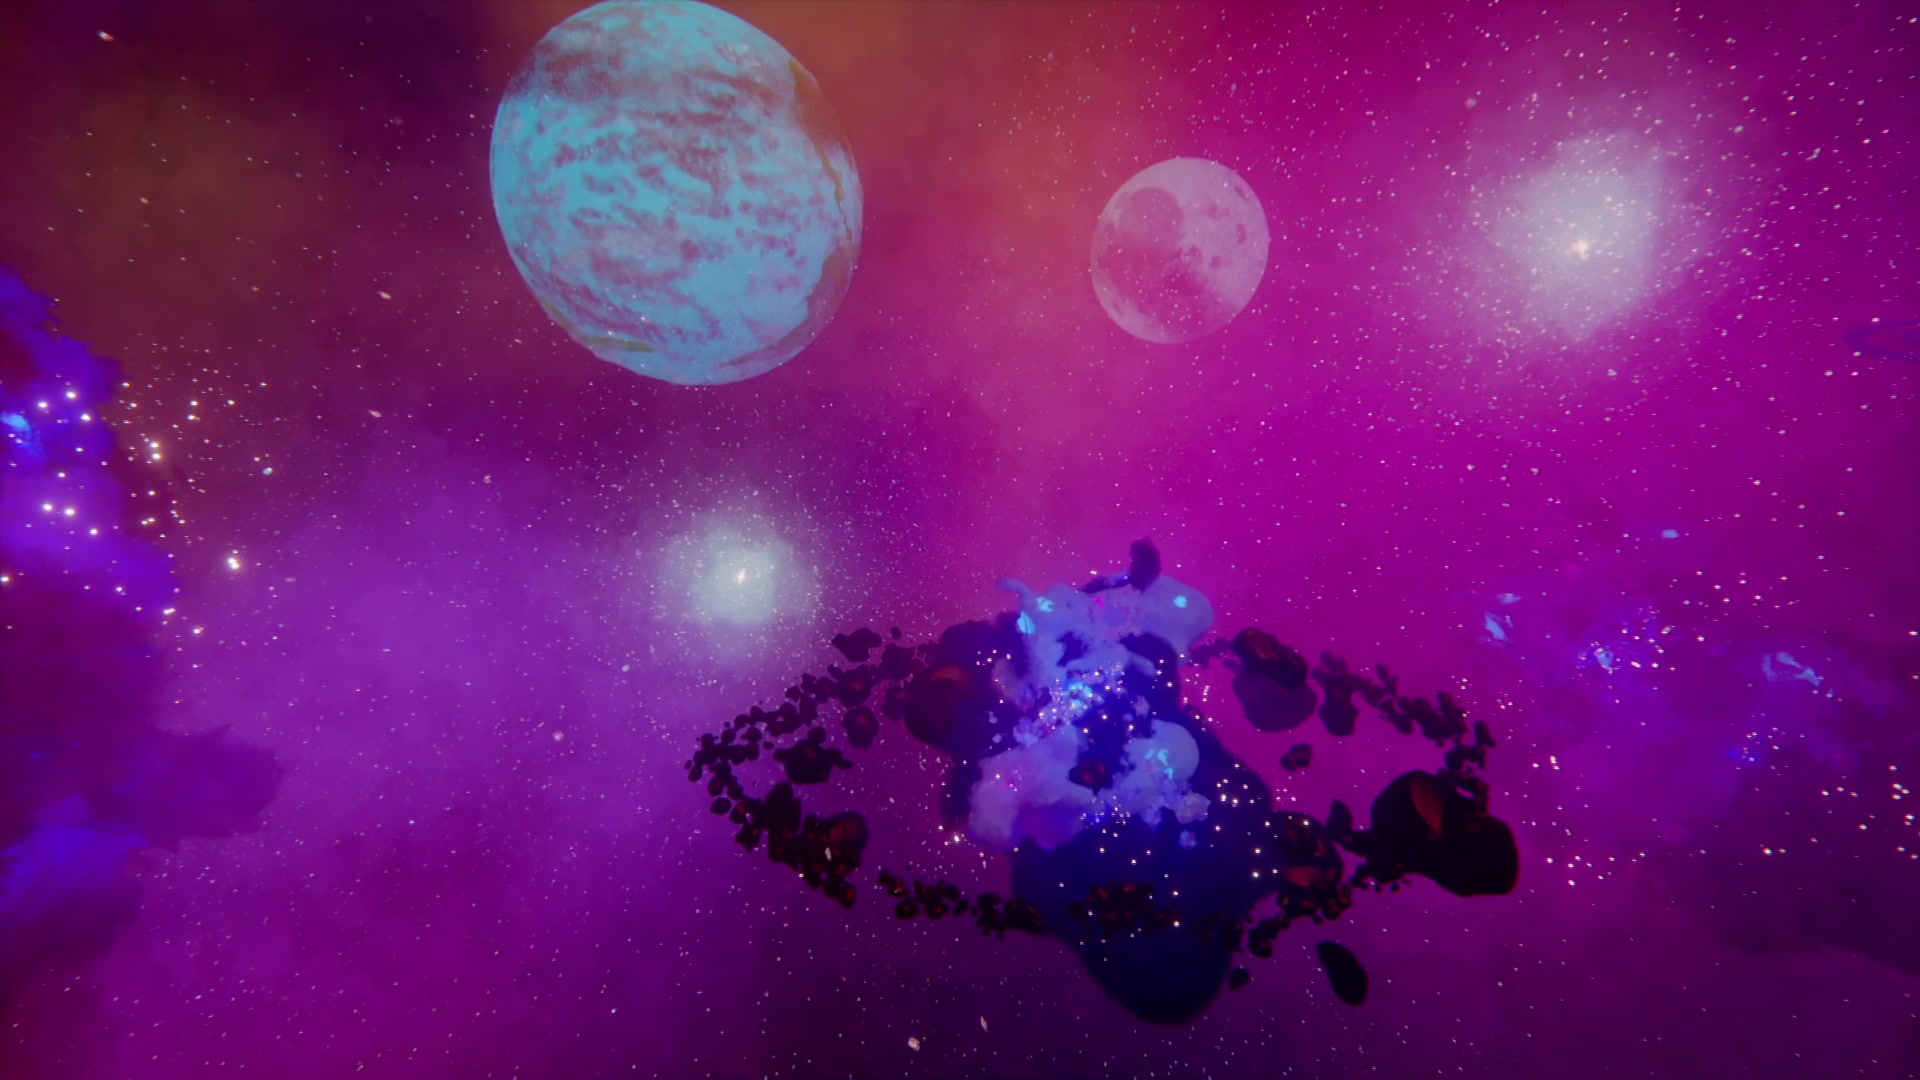 Interstellar Cornfield Chase - Cameron Carpenter, Rahel Senn, Radio Philharmonie Hannover Des NDR, Michael England